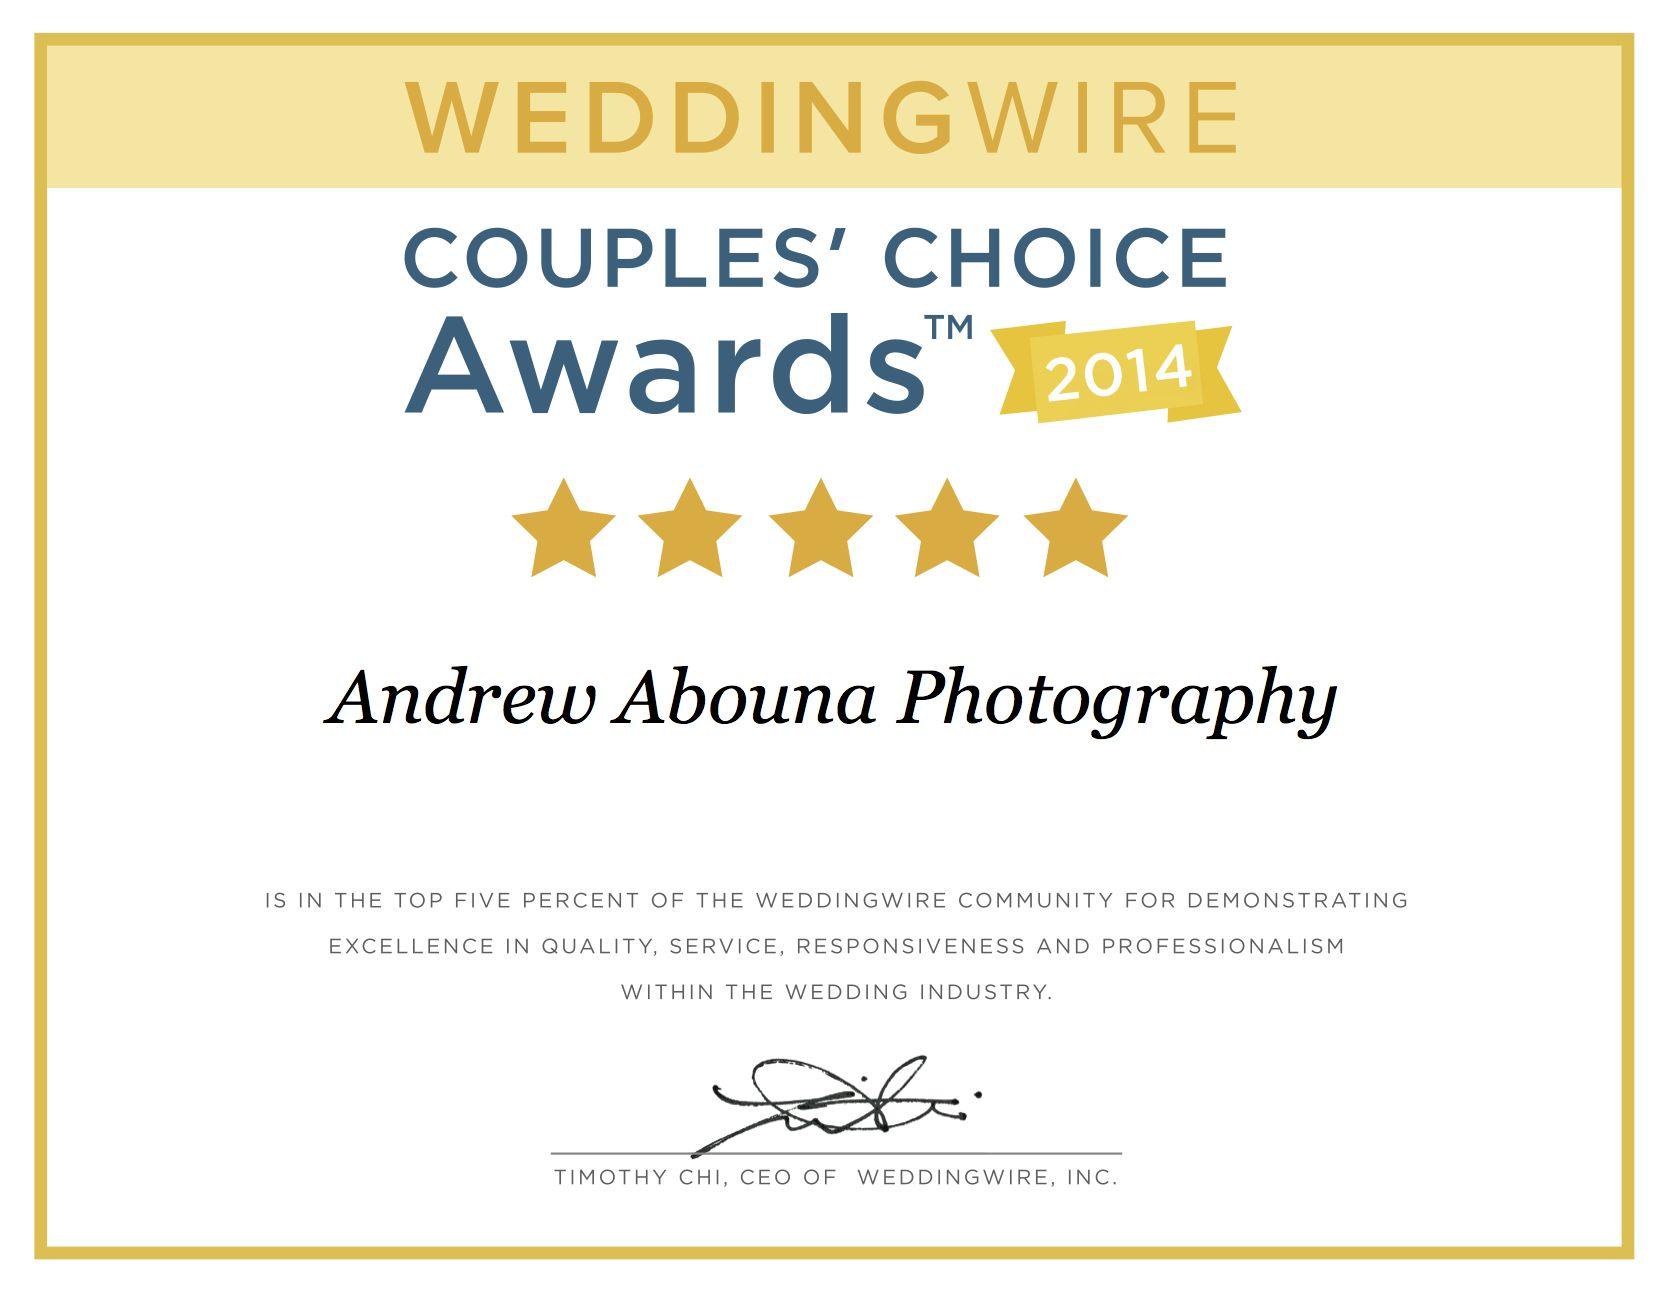 Our National Award as Top San Diego Photographers